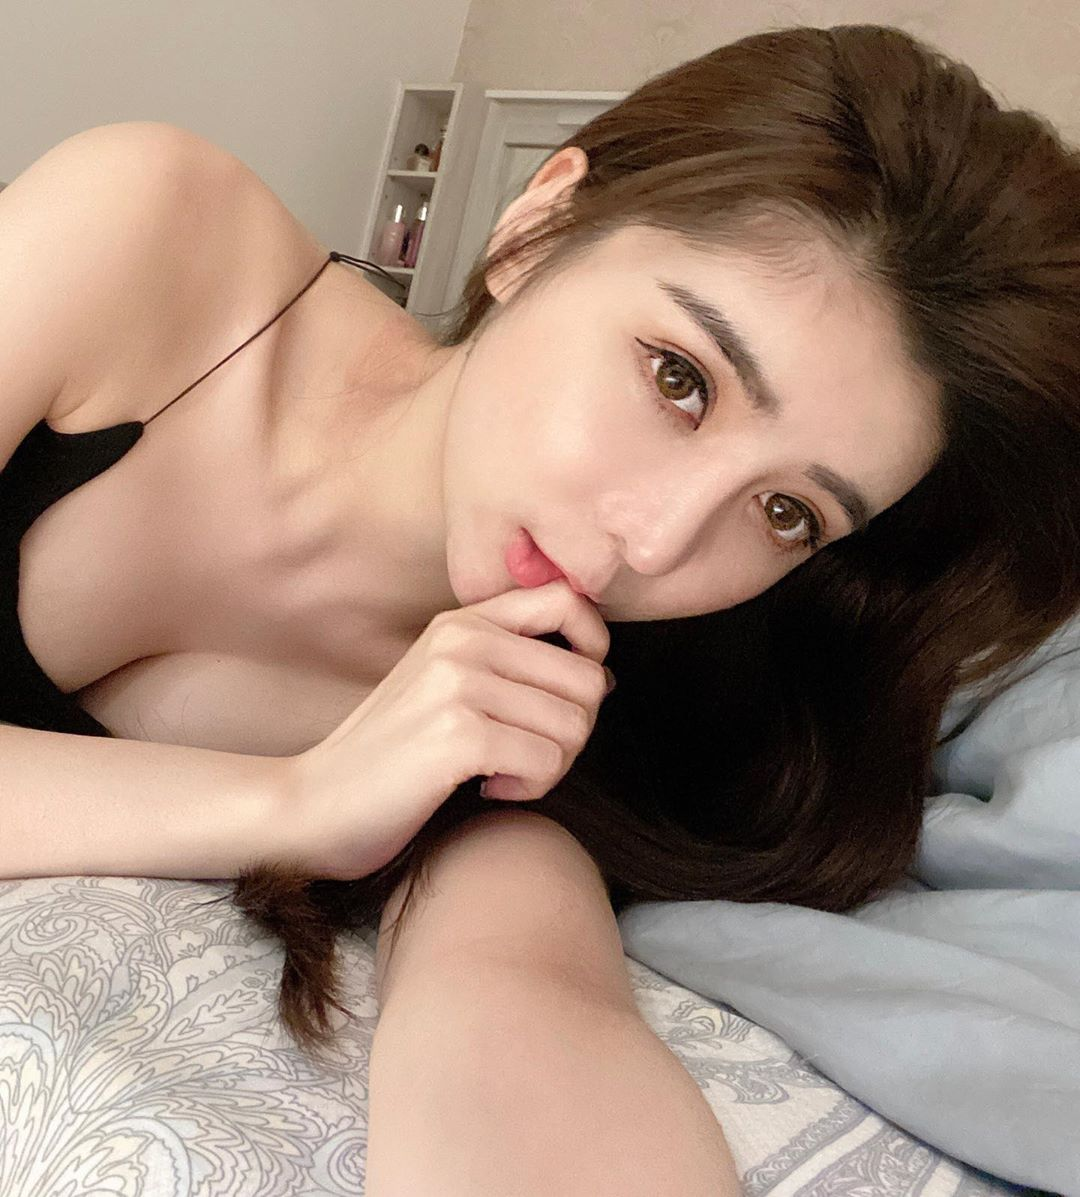 pbJ3KTtV o - IG正妹—謝立琪 Kiki